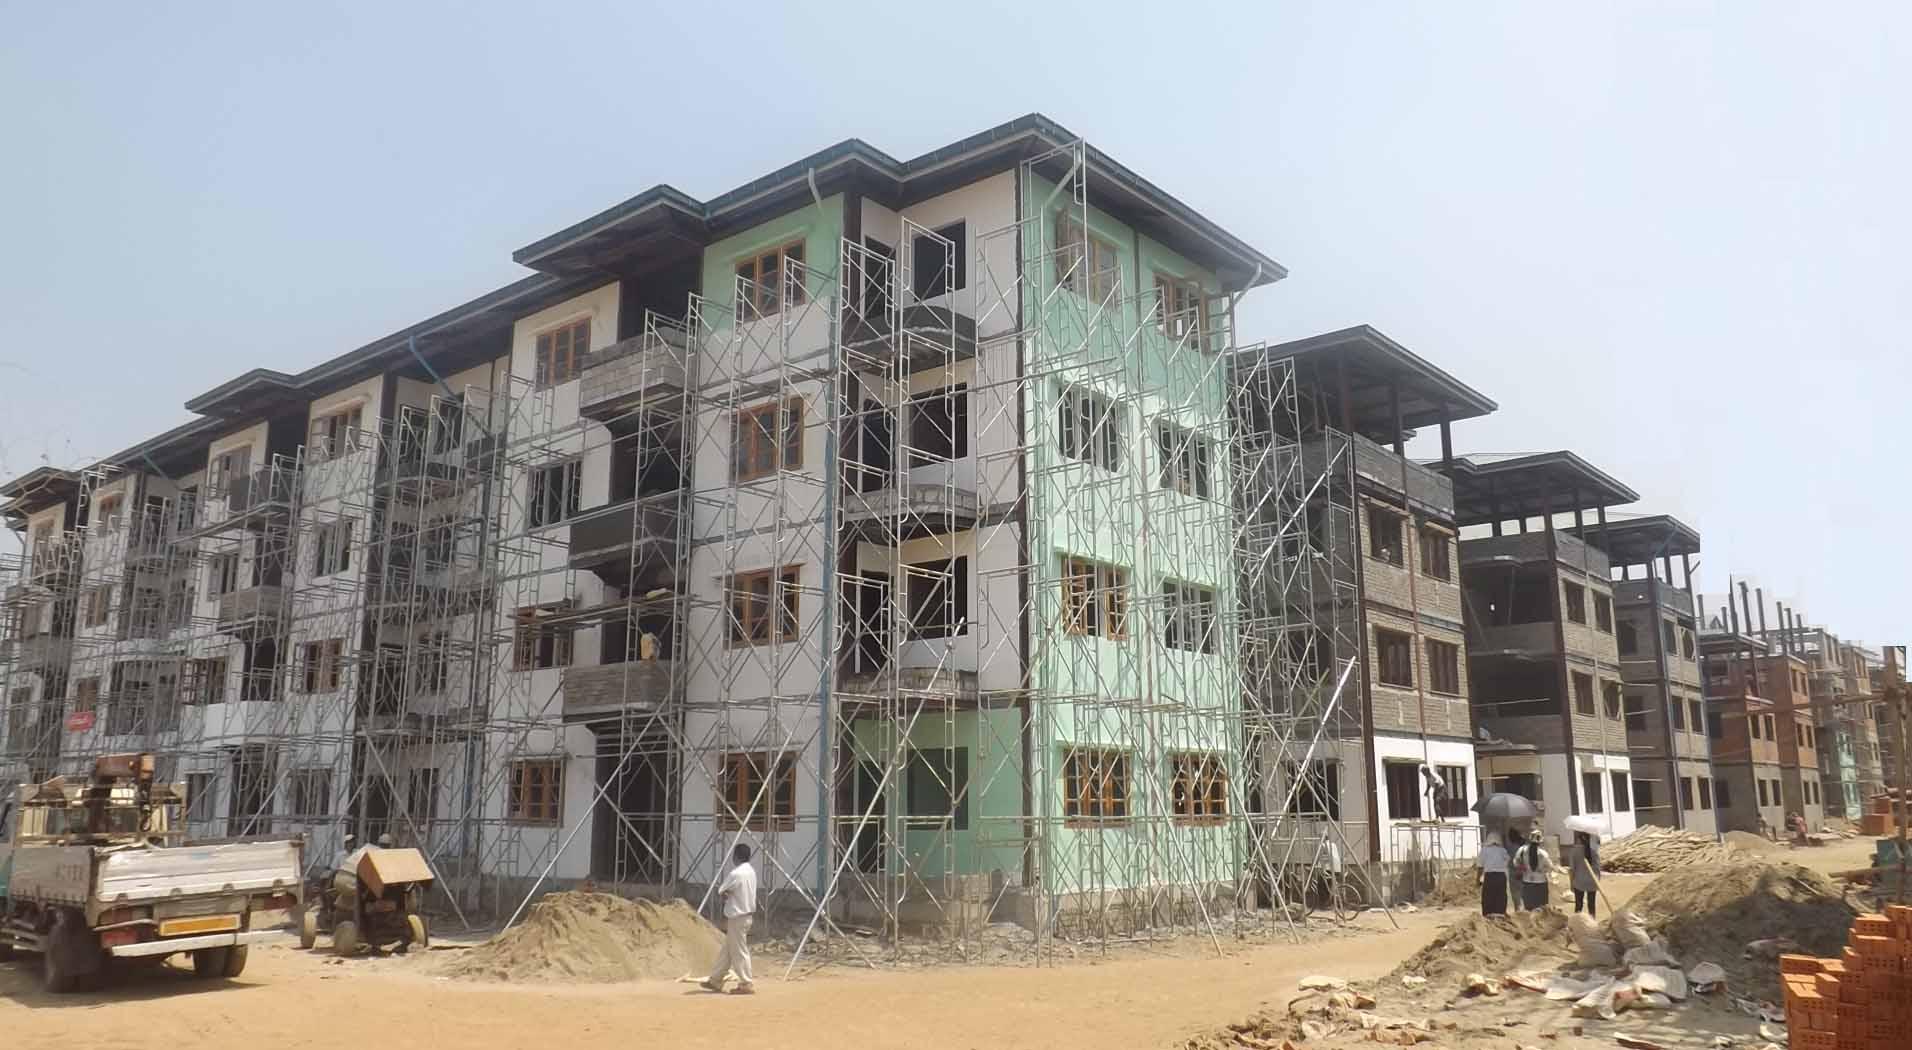 Buildings in Maha Bangoola Housing Complex are under construction. Photo: Shein Khet